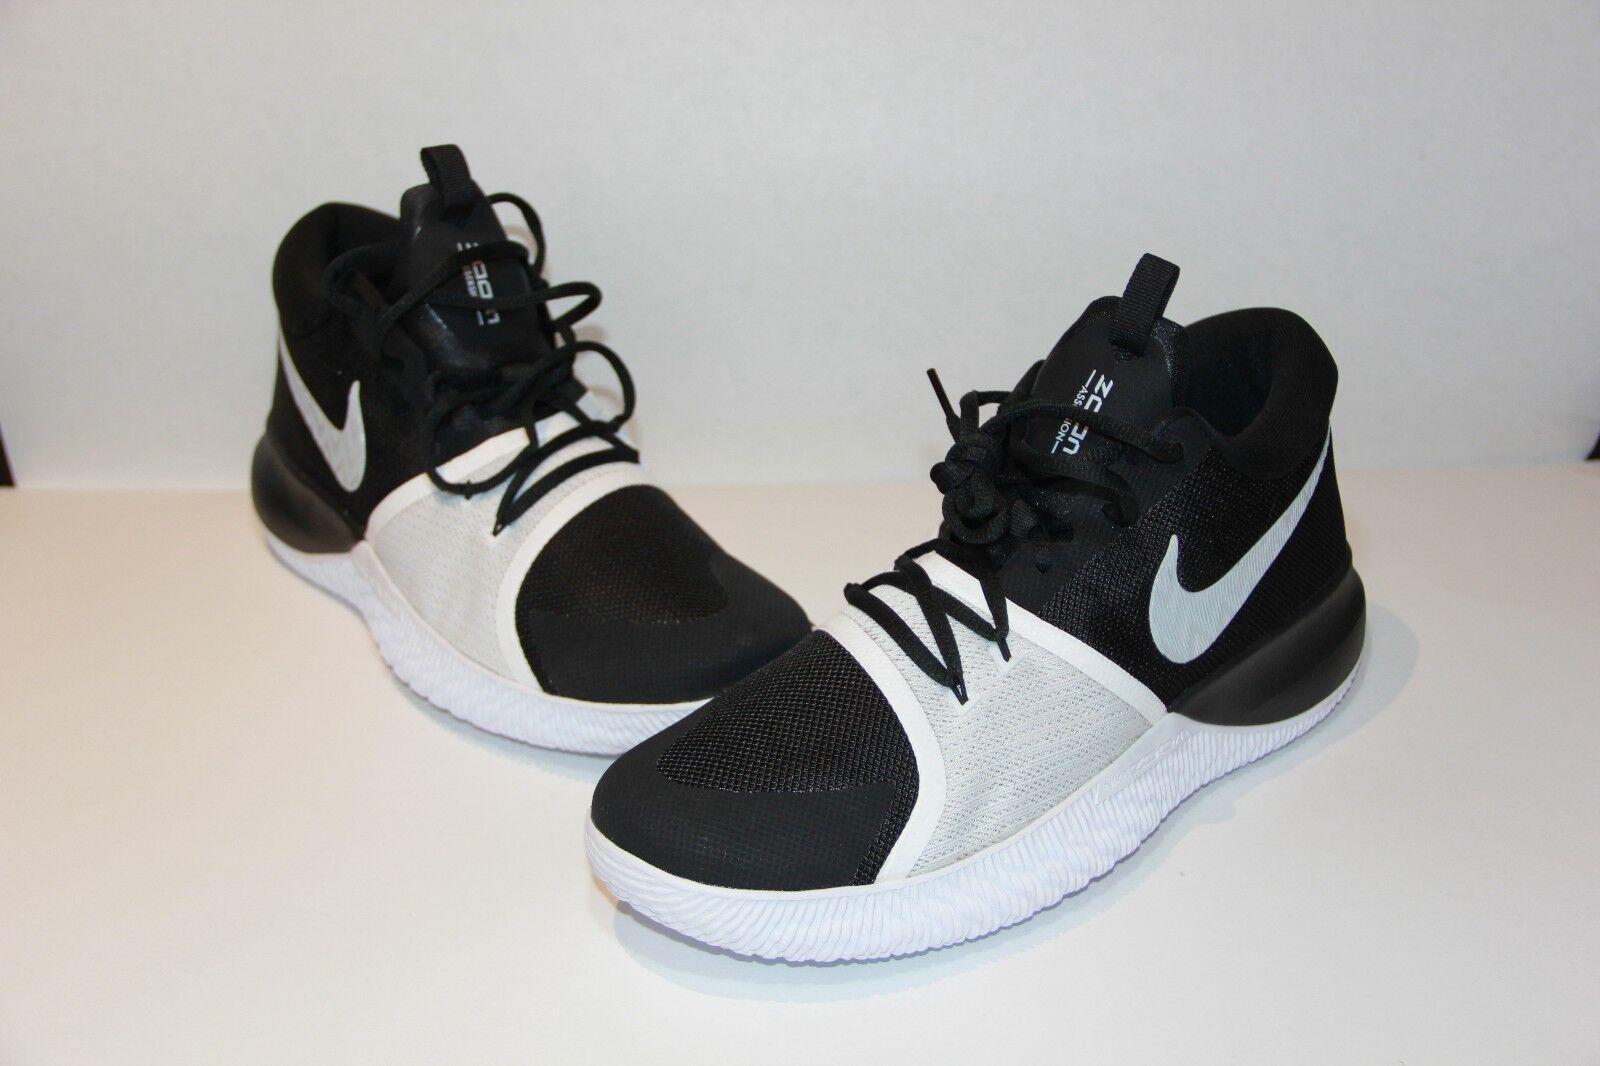 Nike 001 - turnschuhe assersion schuhe laufen  917505 001 Nike  11,5 uns 10127f